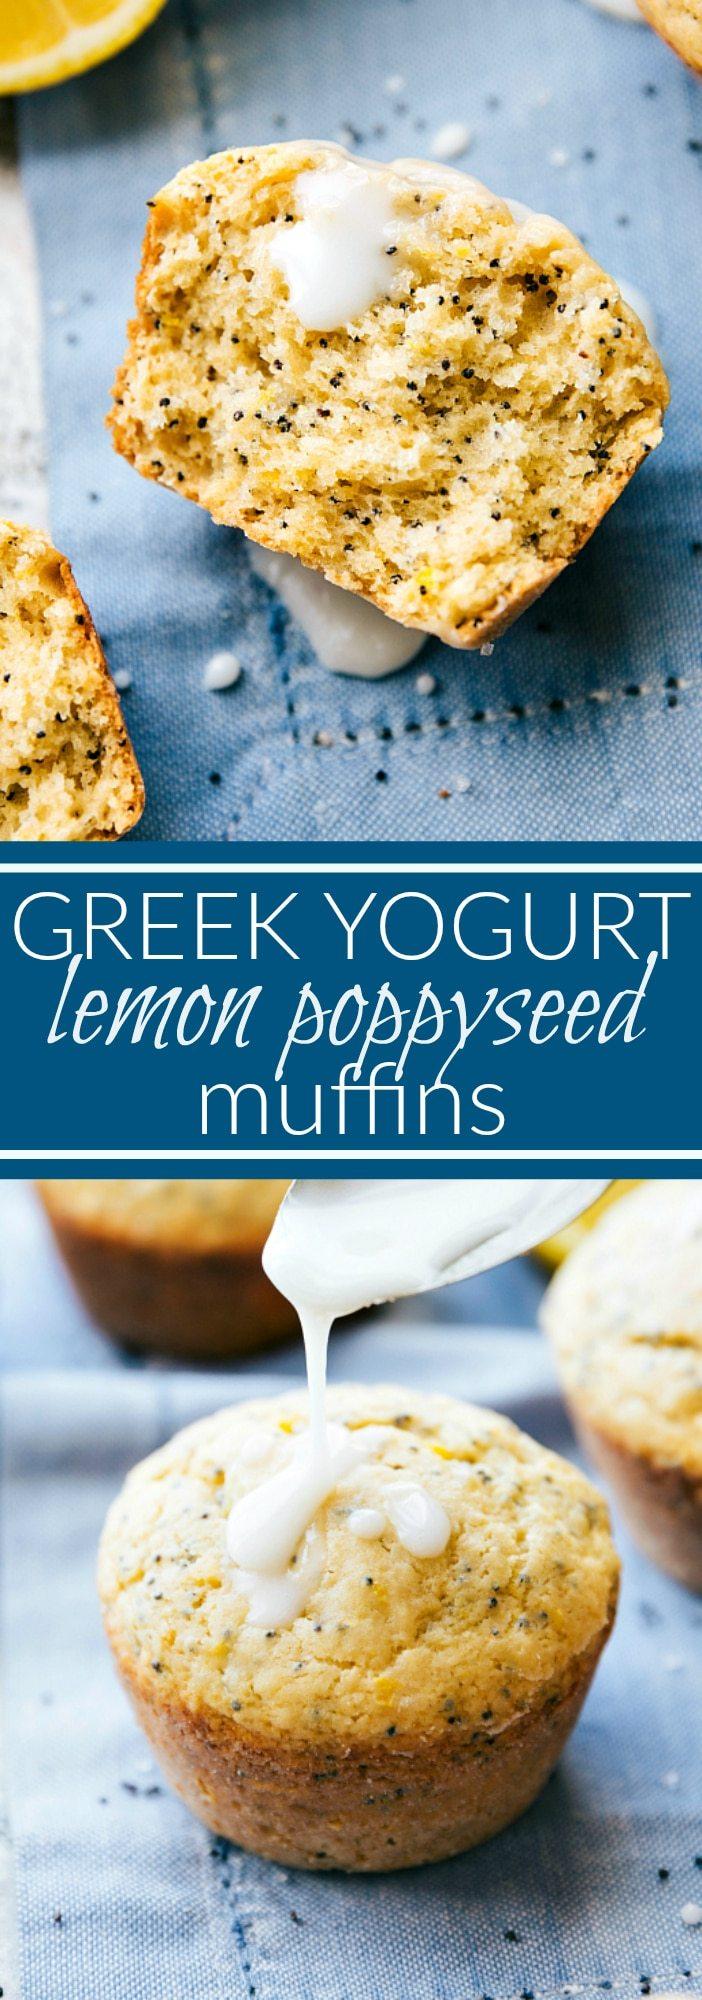 GREEK YOGURT LEMON POPPYSEED MUFFINS. Made with healthier ingredients! via chelseasmessyapron.com